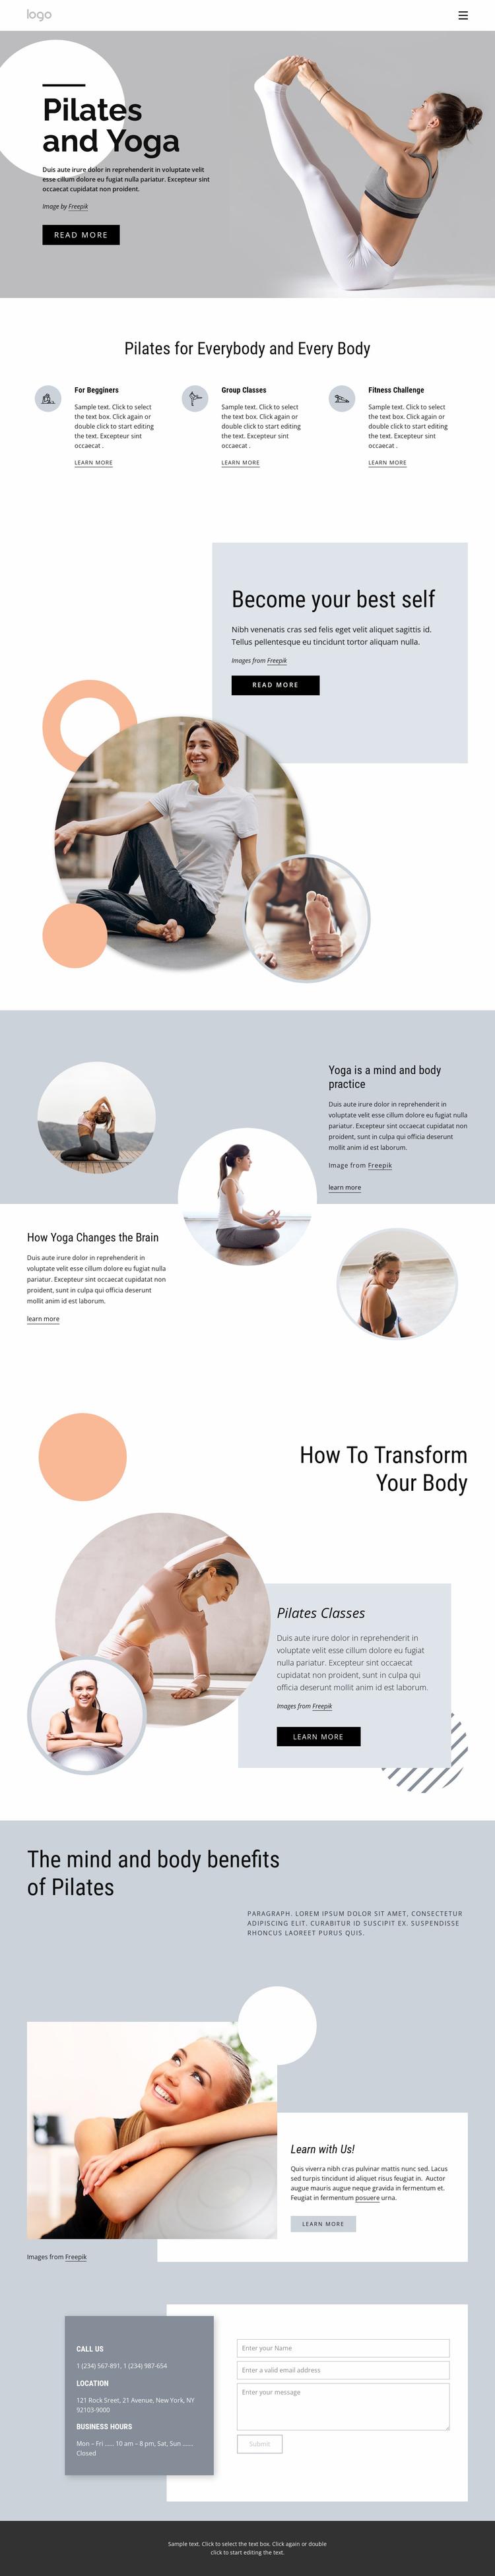 Pilates and yoga center Website Template